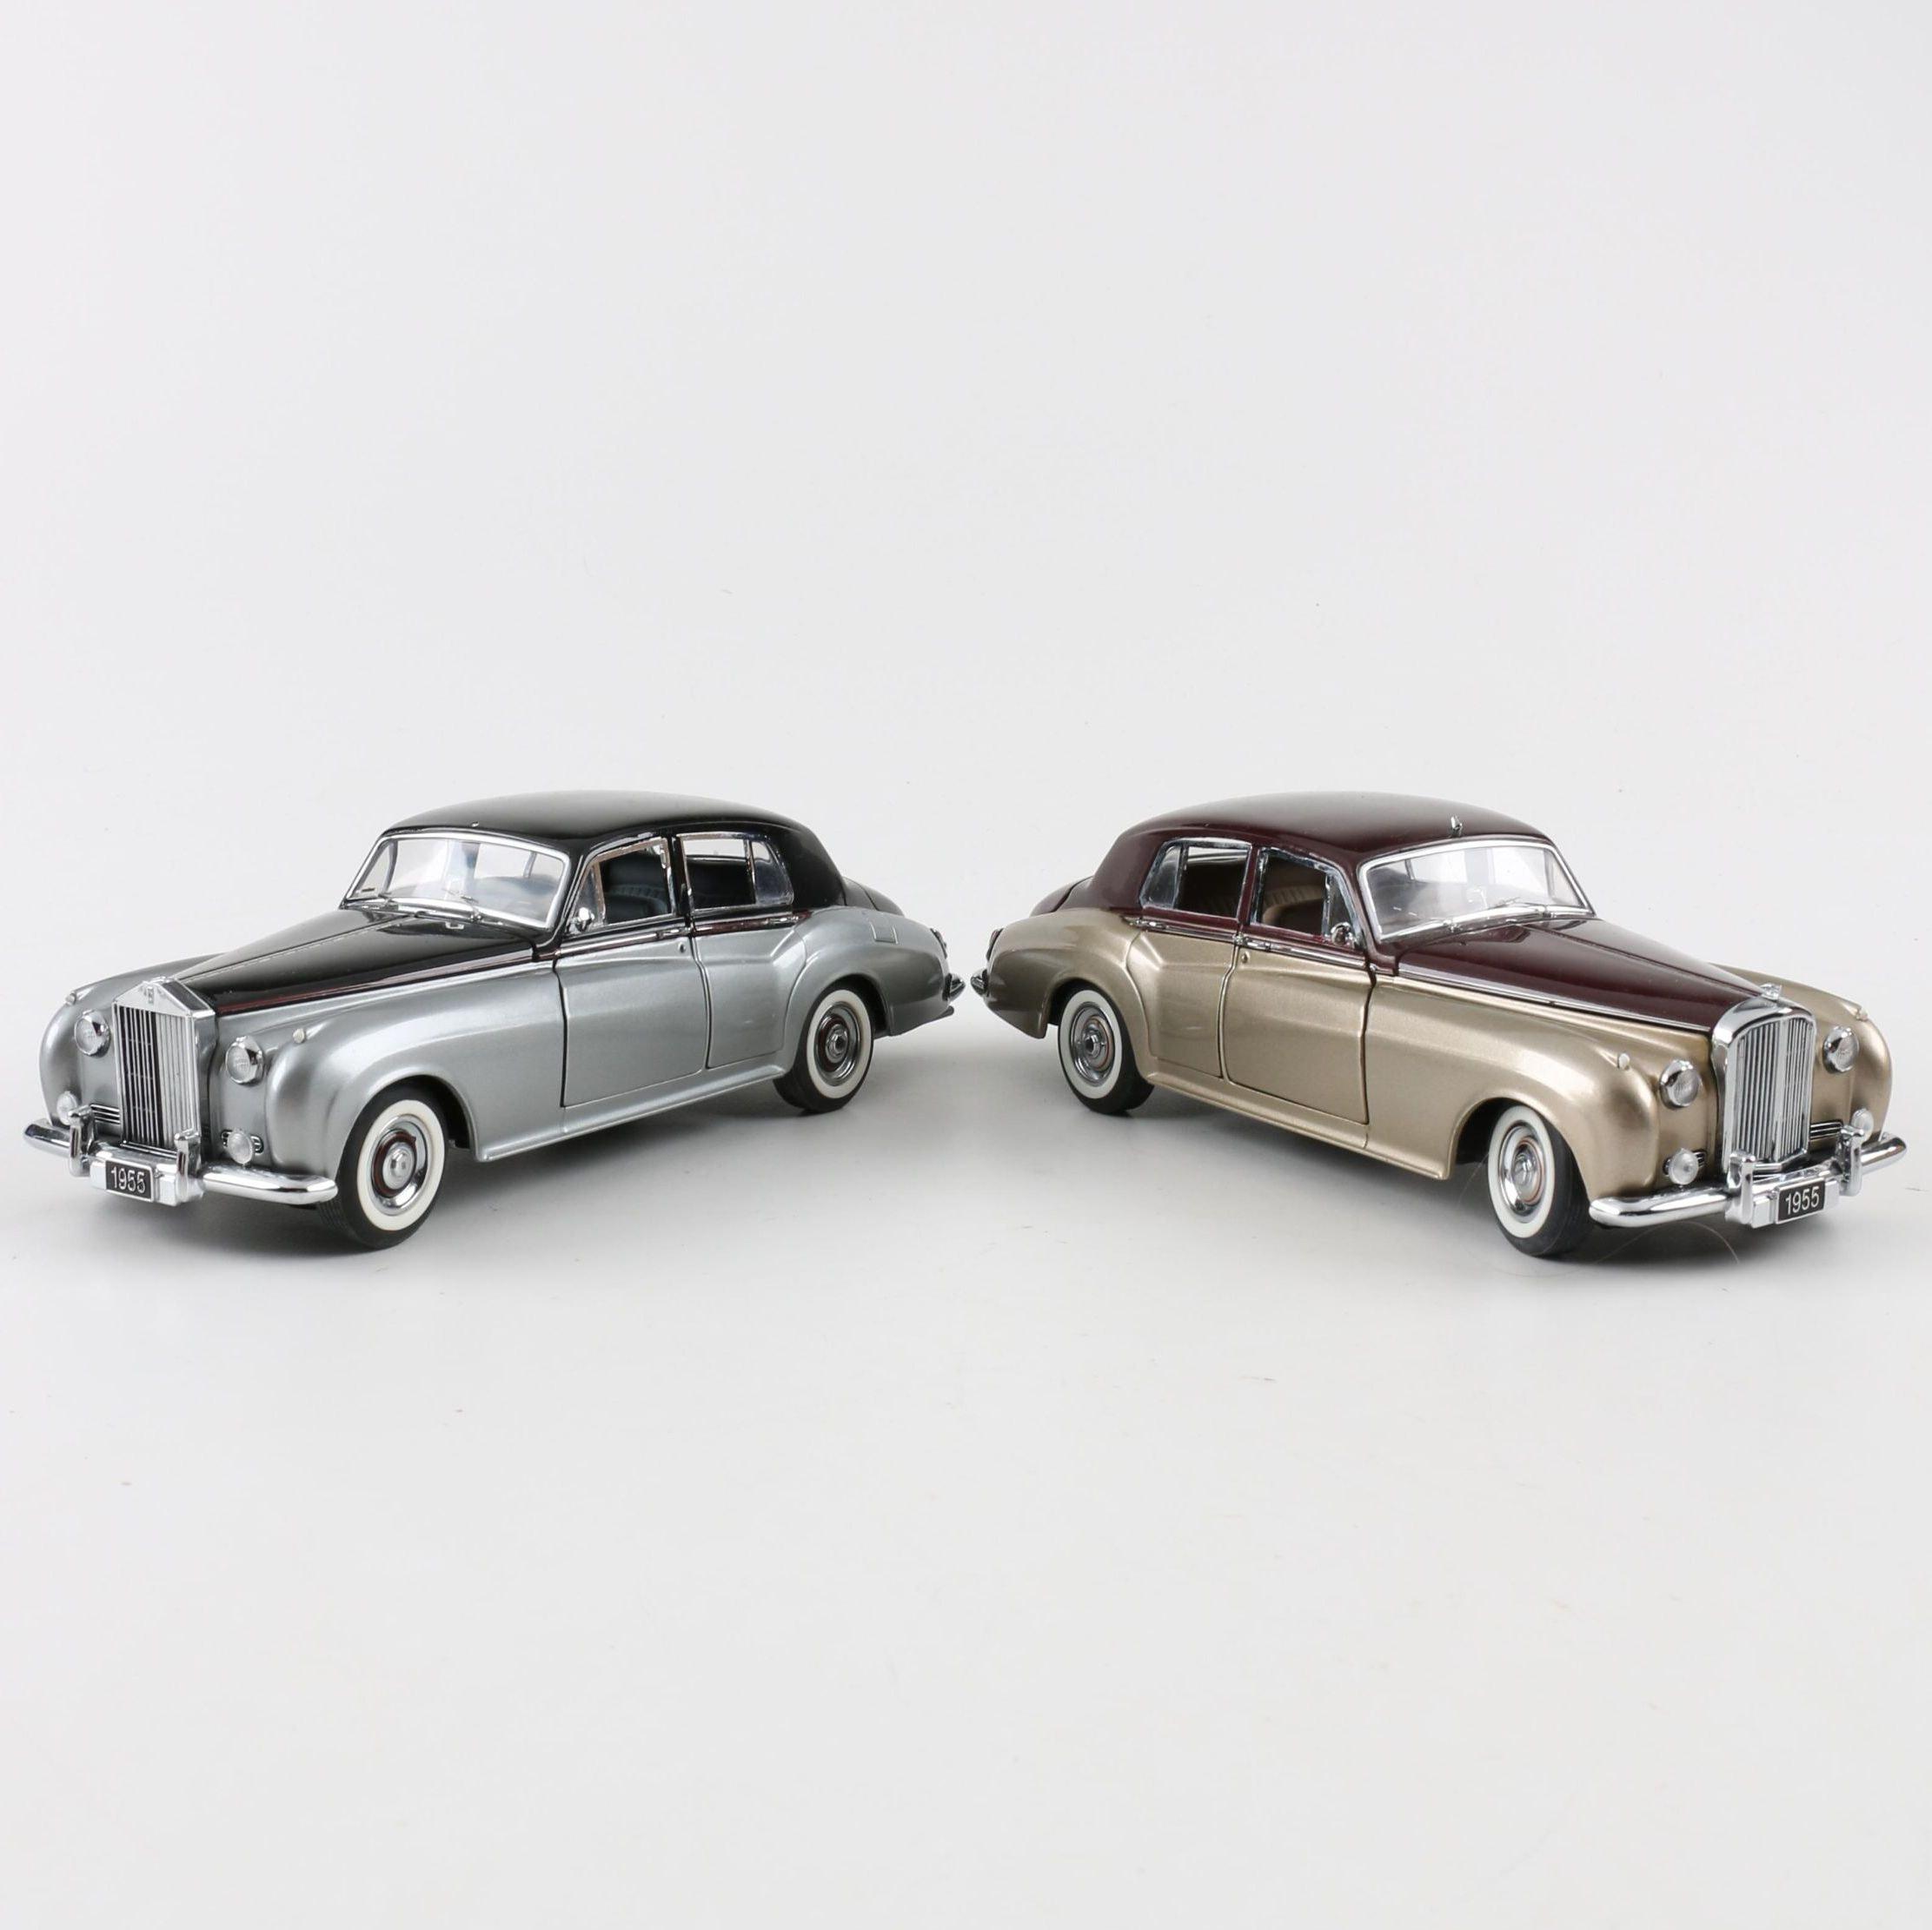 1955 Bentley And Rolls Royce Franklin Mint Die Cast Cars Ebth